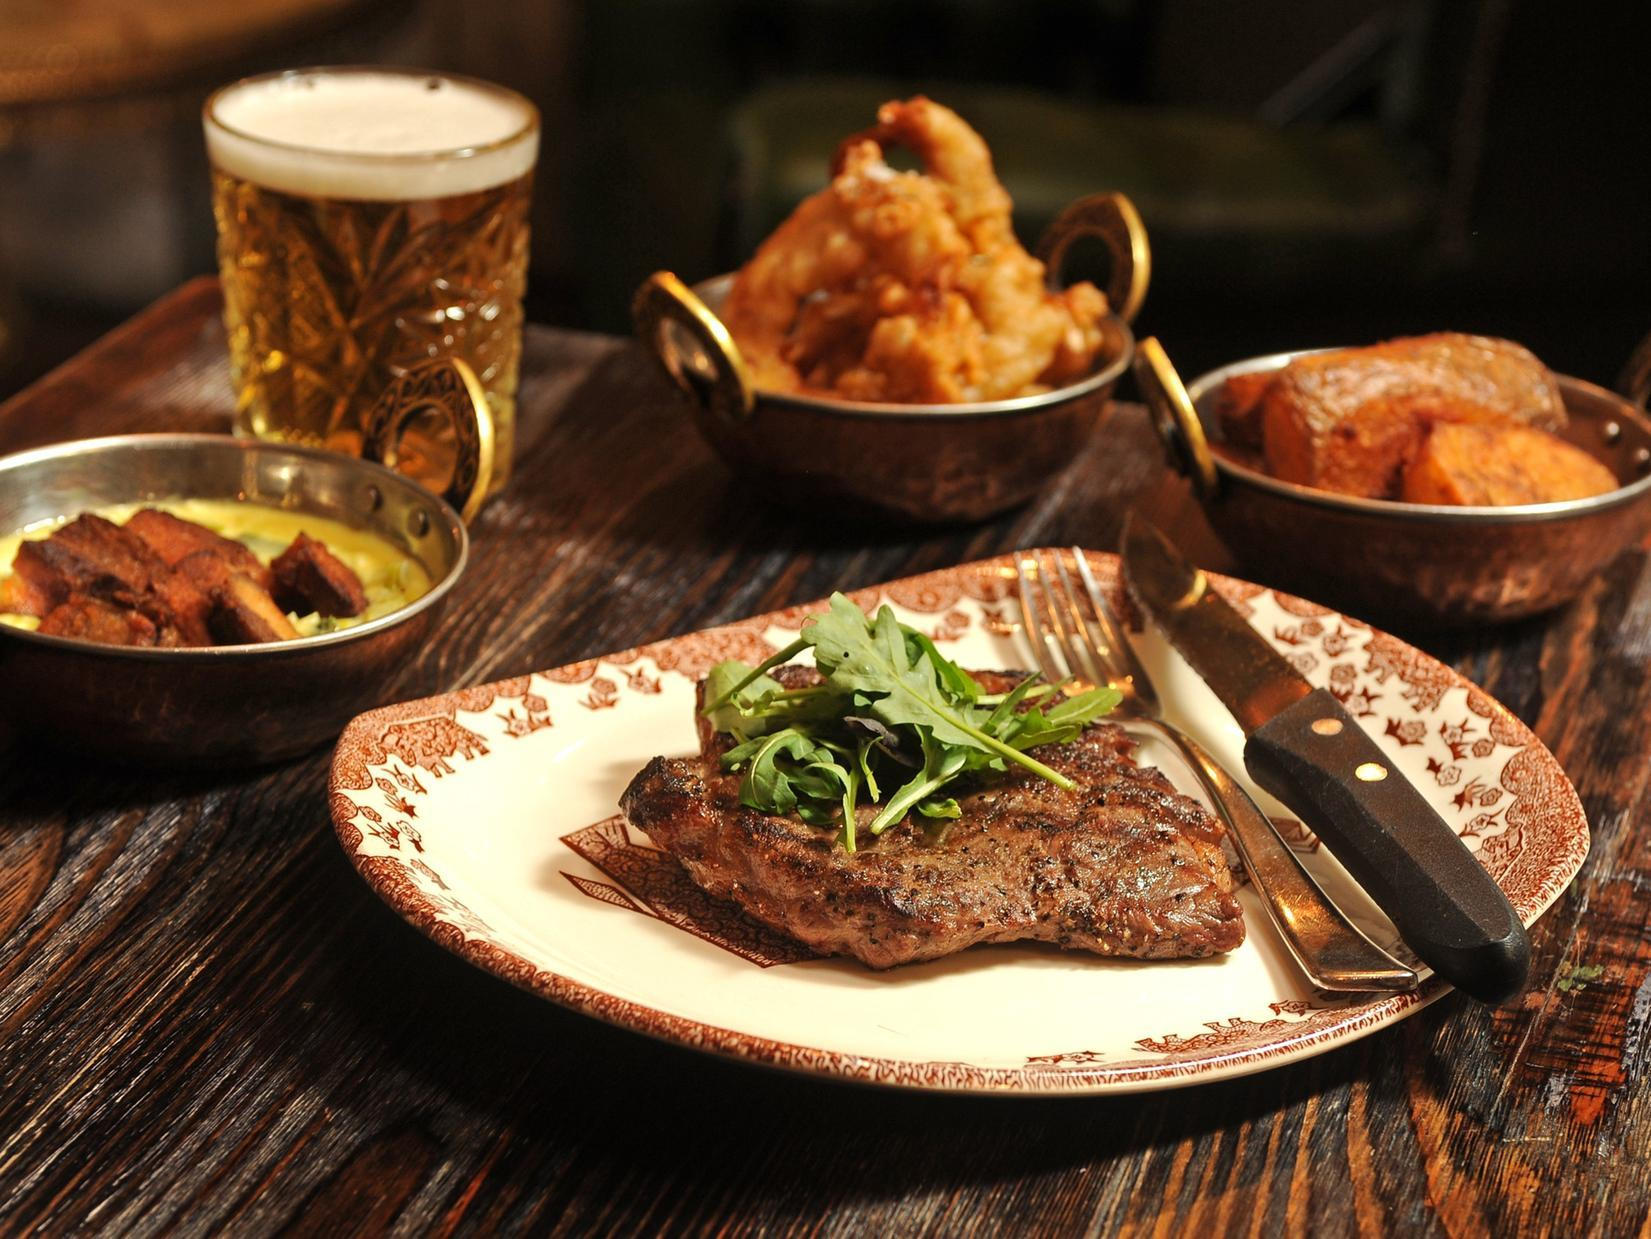 The ten best steak restaurants in Leeds - according to TripAdvisor reviews